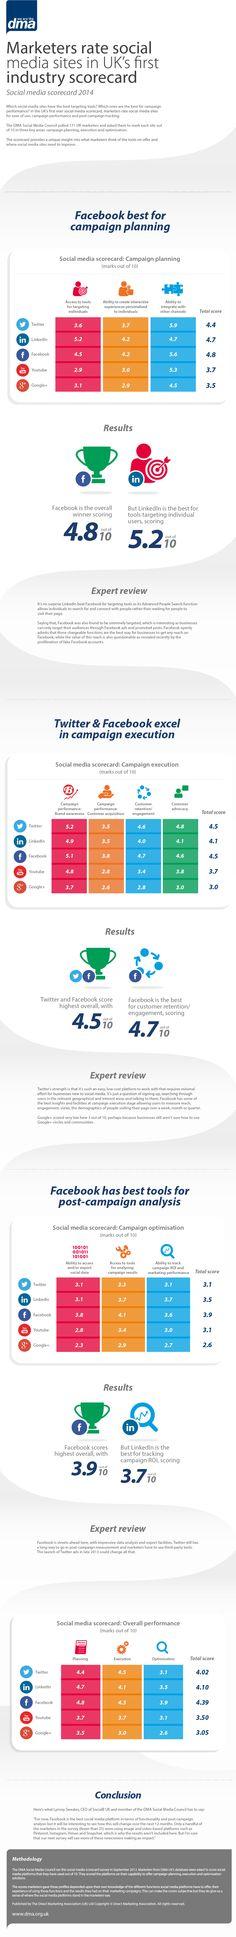 "#SocialMedia Scorecard 2014 - #Facebook ""Most Marketing Friendly"" Social Platform - #infographic"